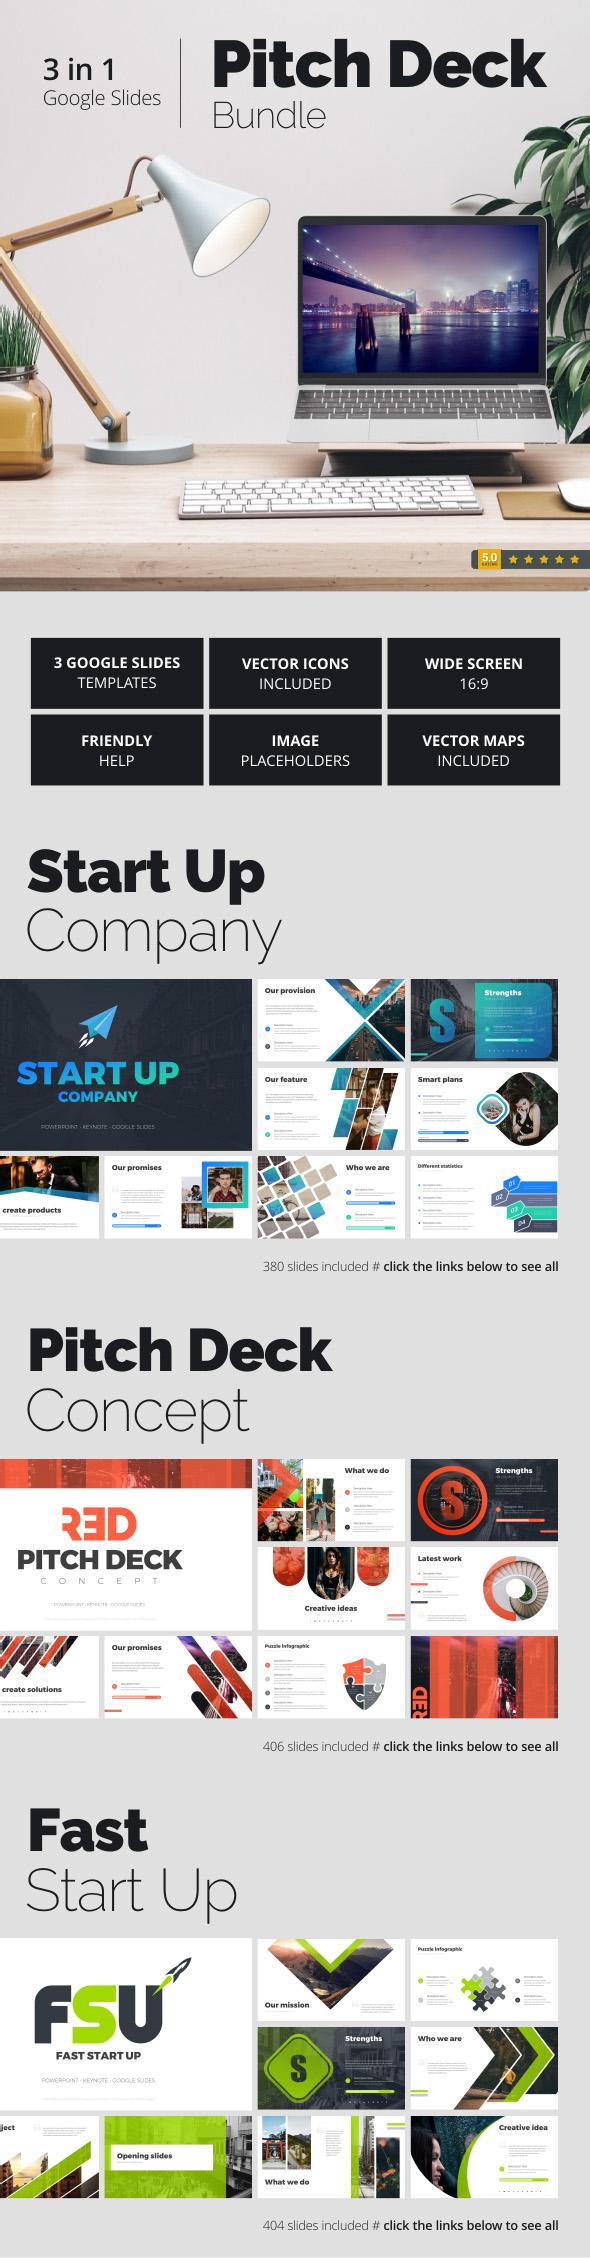 Pitch Deck Bundle - Google Slides Presentation Templates